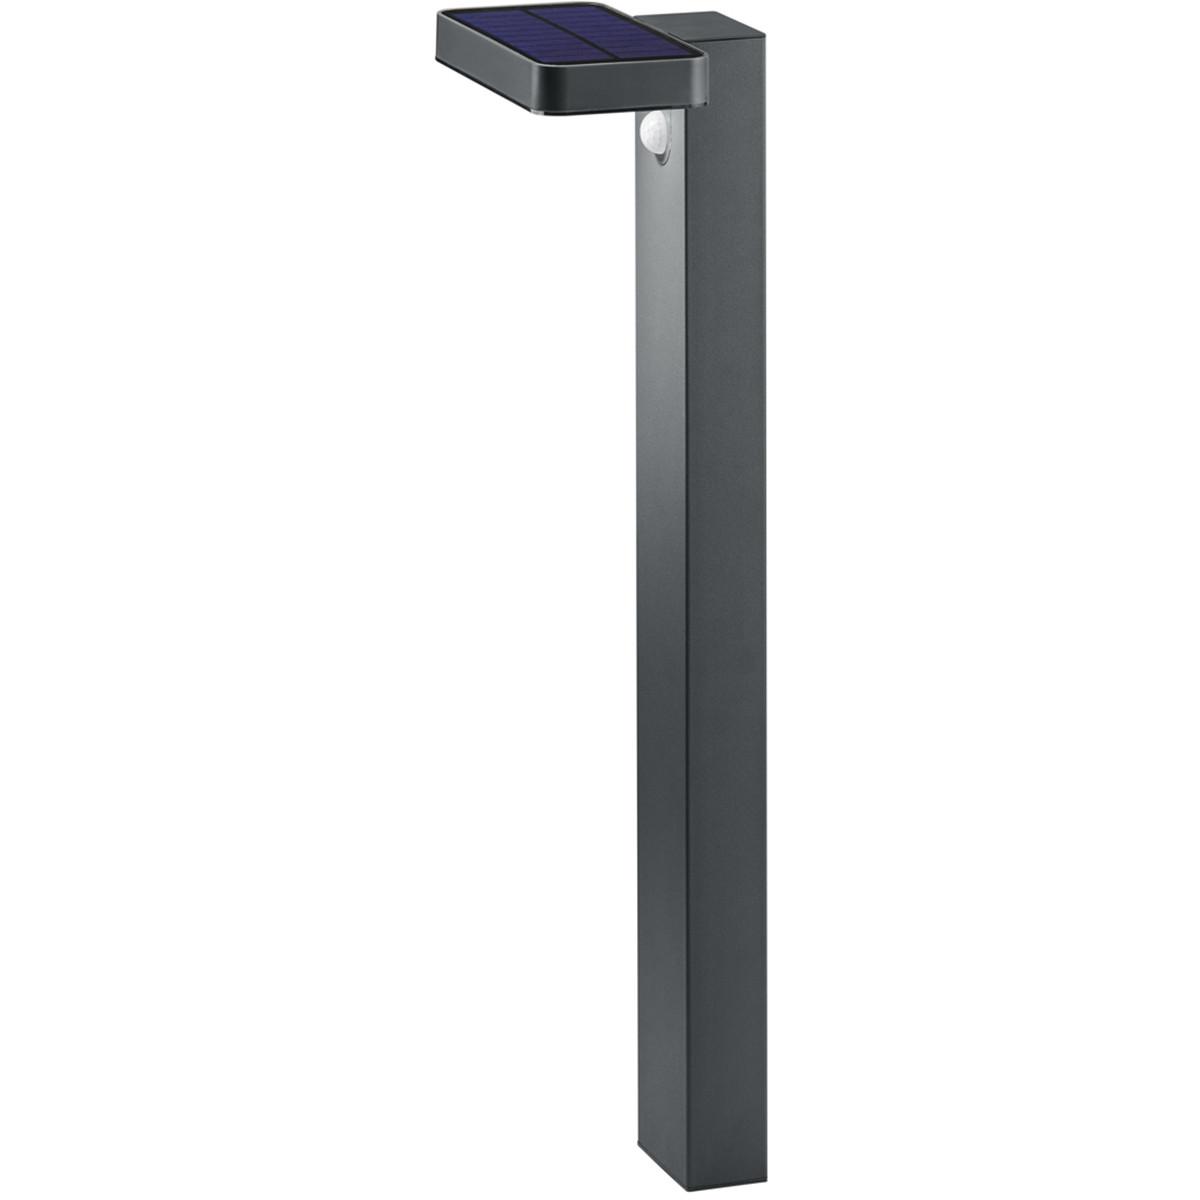 LED Solar Tuinverlichting - Paal/Sokkel - Trion Escarino - Zonne-energie - Bewegingssensor - 4W - Mat Zwart - RVS